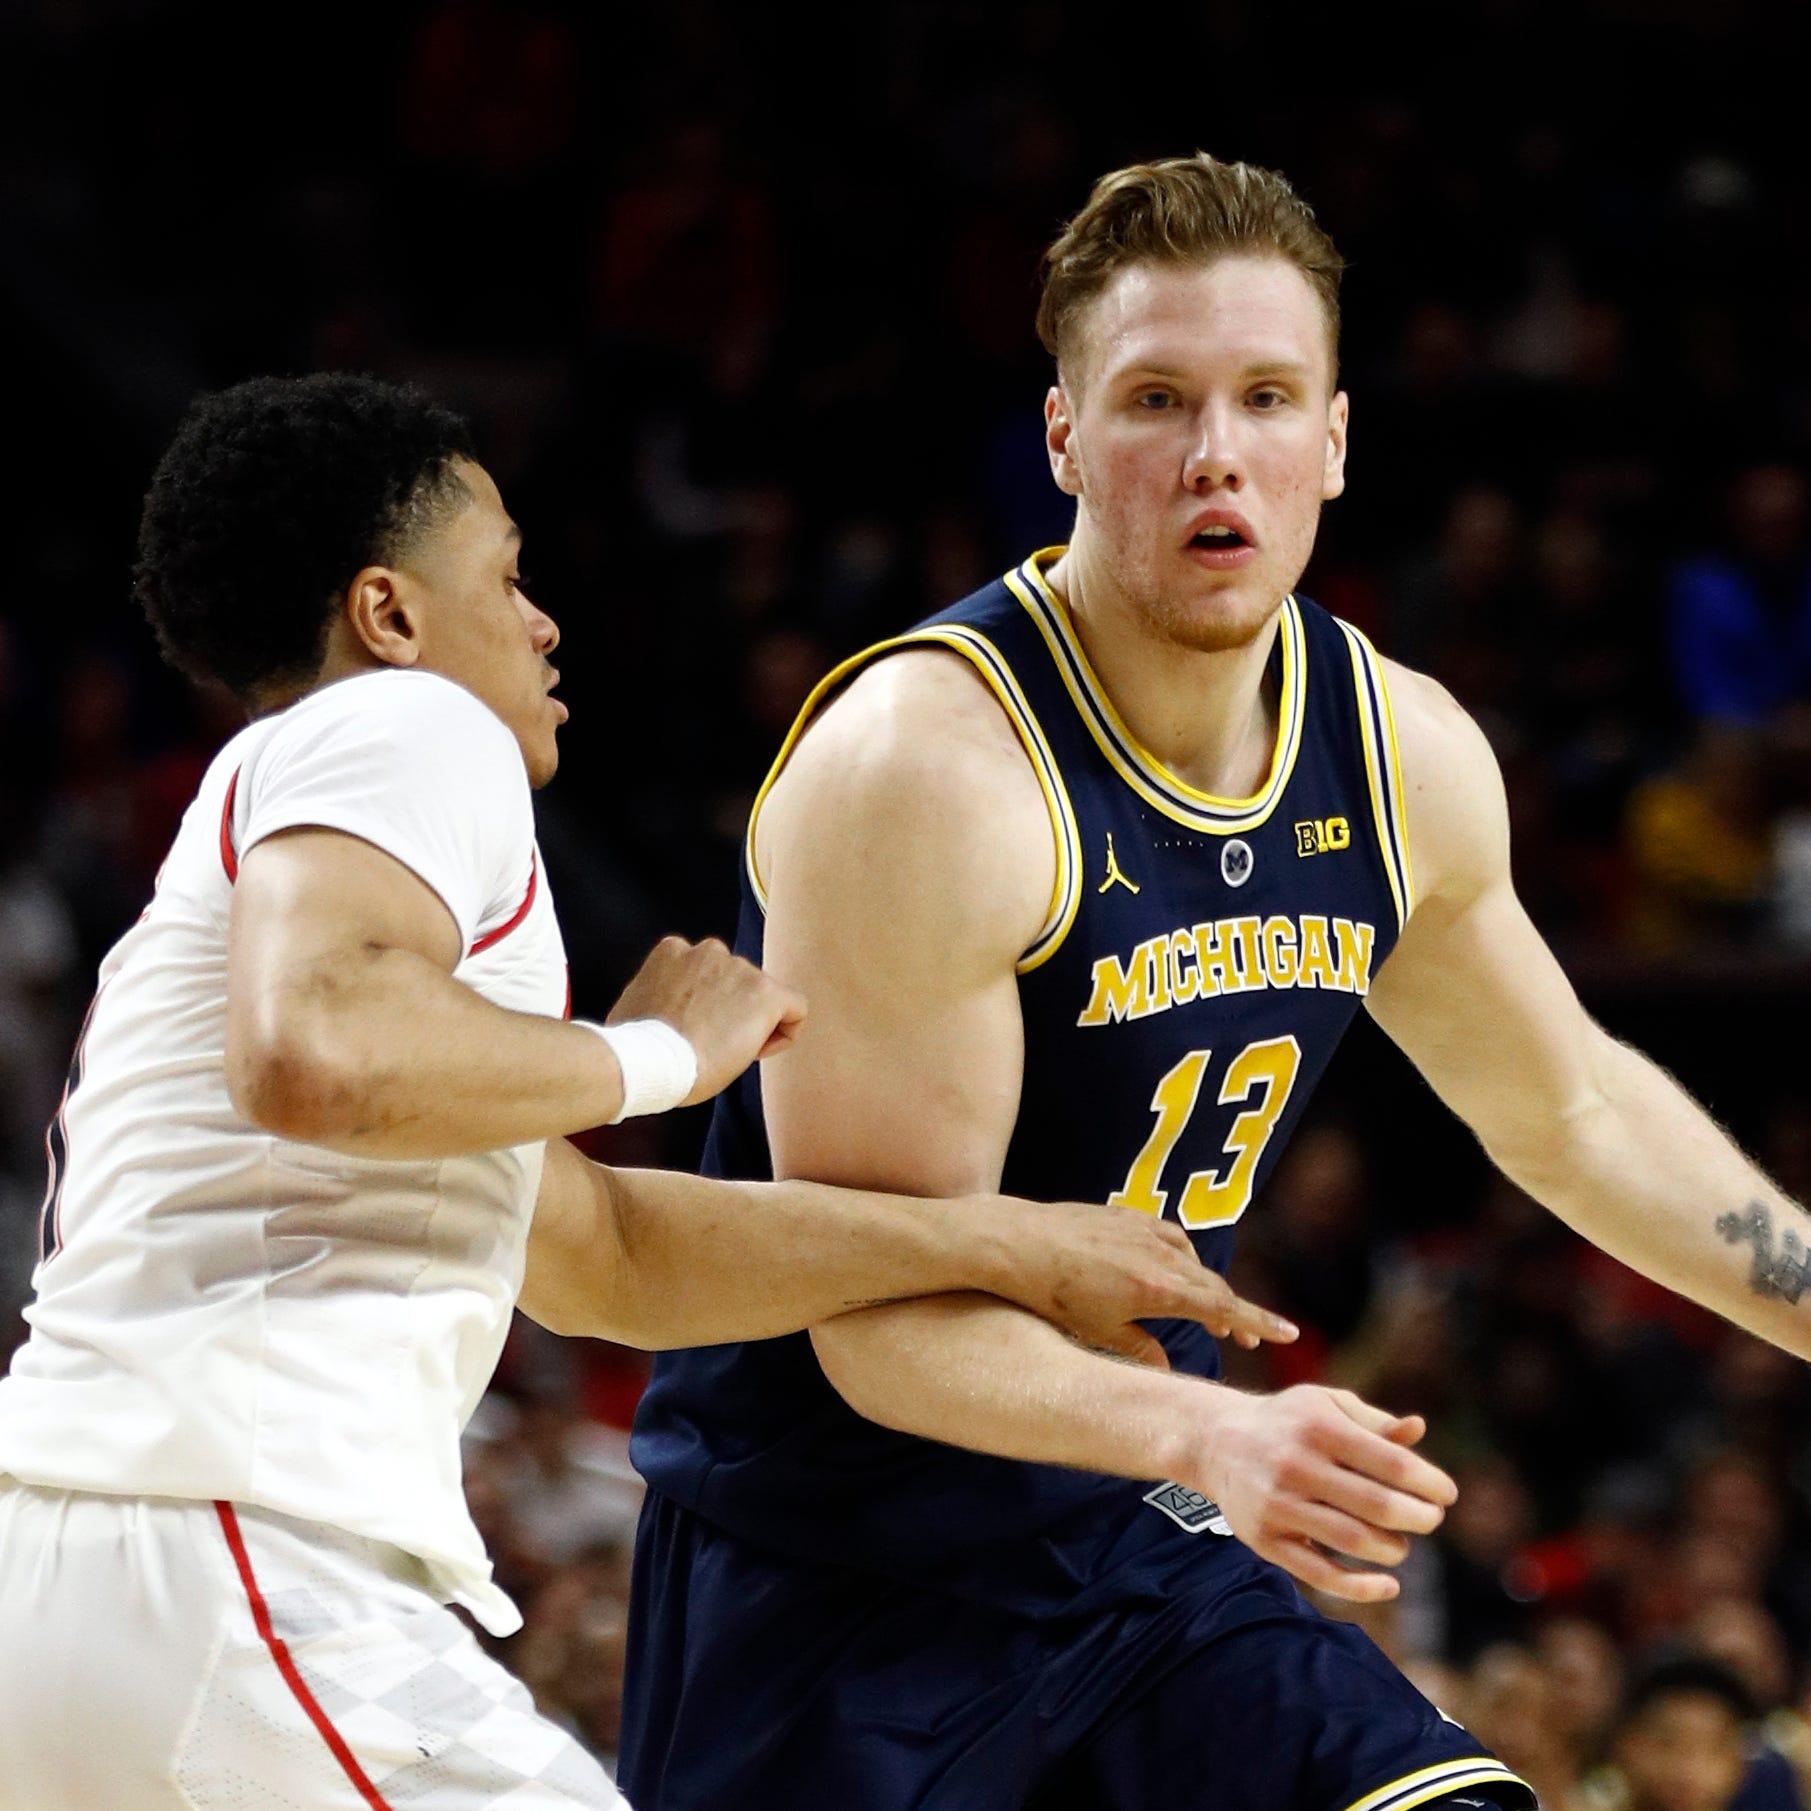 Michigan basketball earns best road win of season at Maryland, 69-62